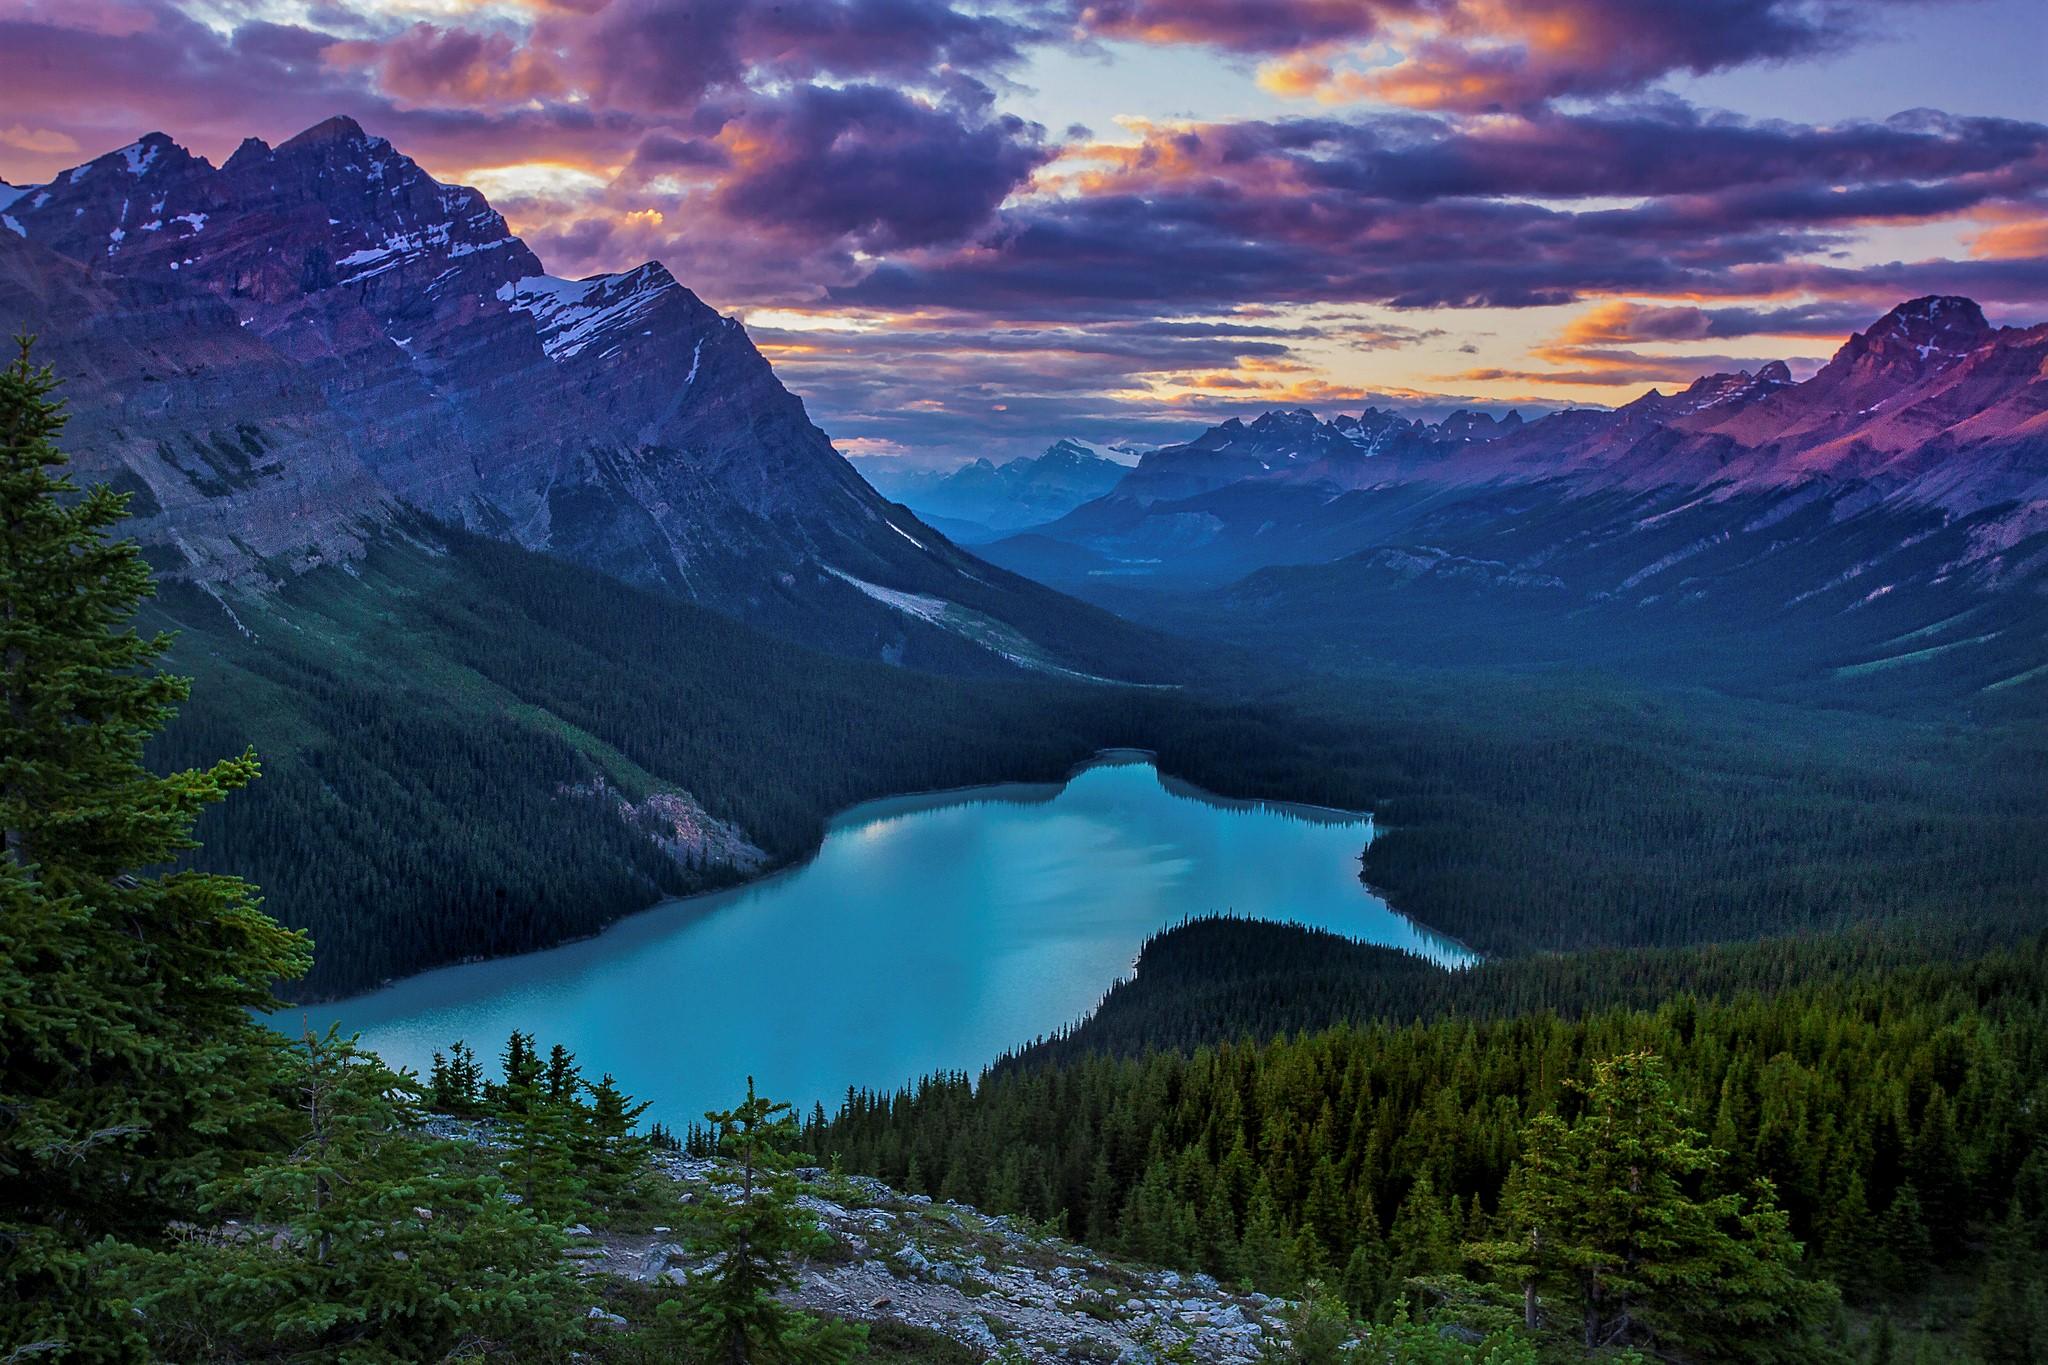 Cloud Forest Lake Landscape Mountain Sunset 2048x1365